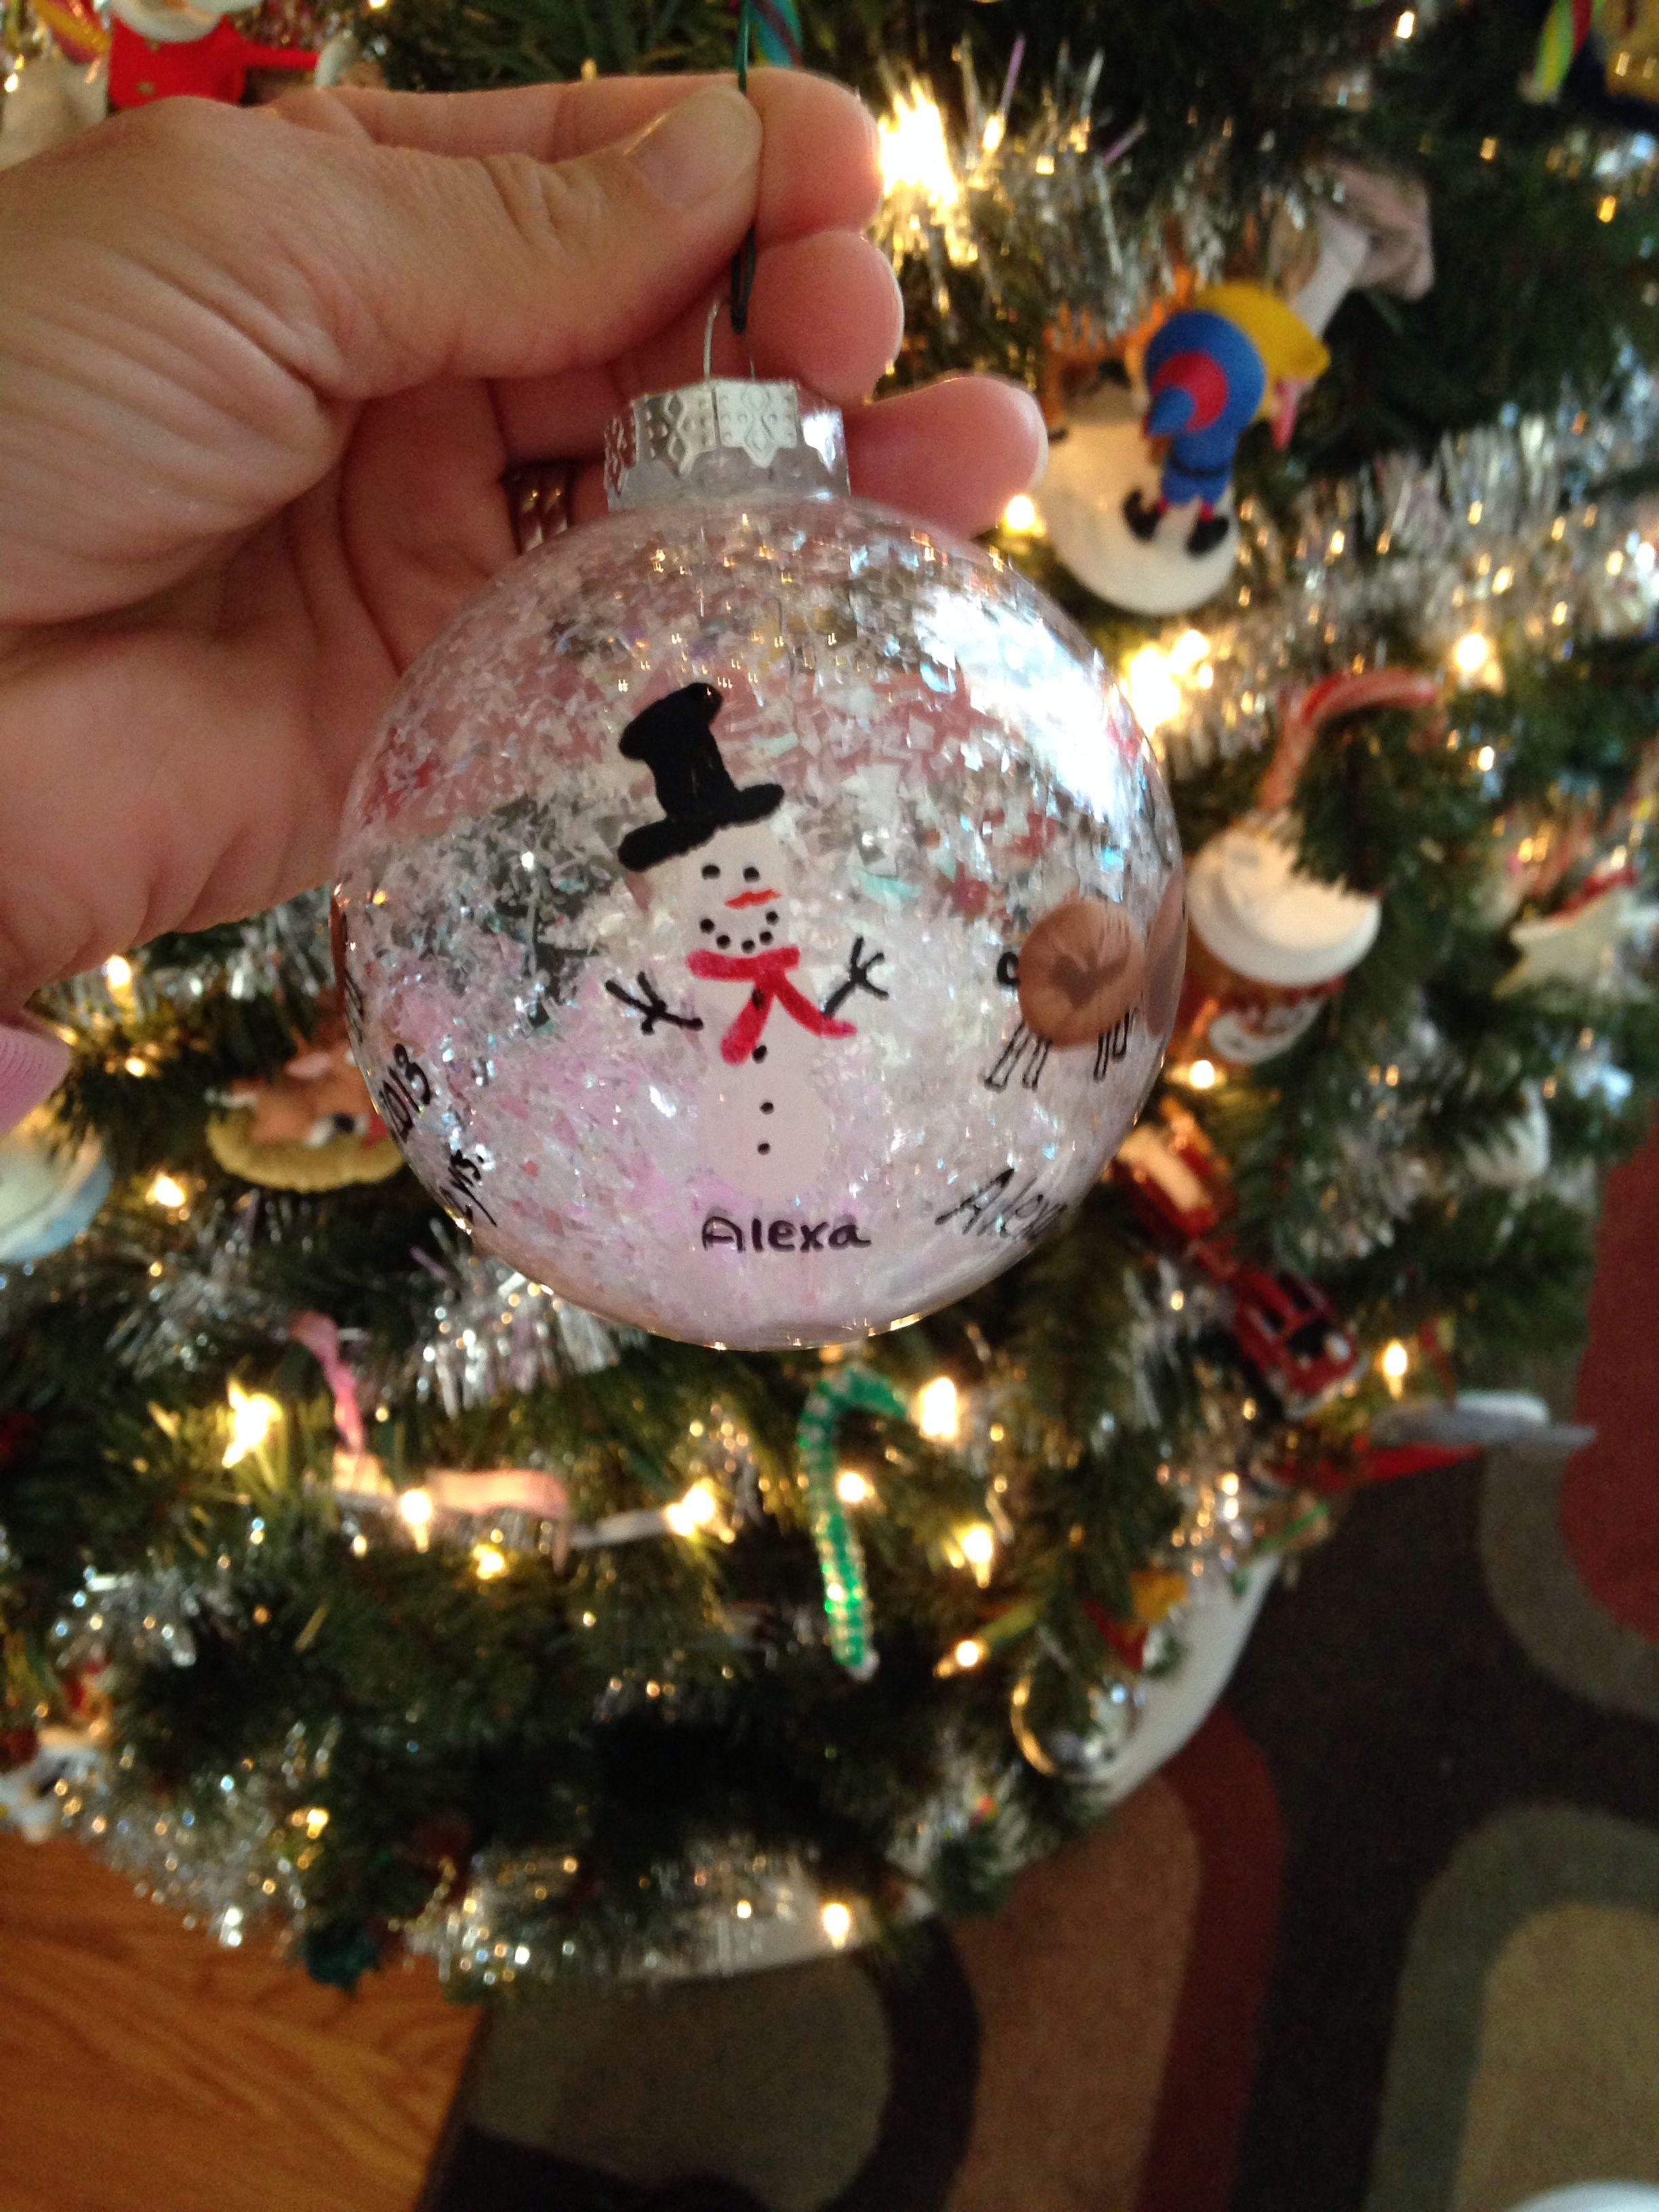 Preschool Christmas Ornament Craft Ideas  DIY Christmas Ornament for kids we used thumb prints to